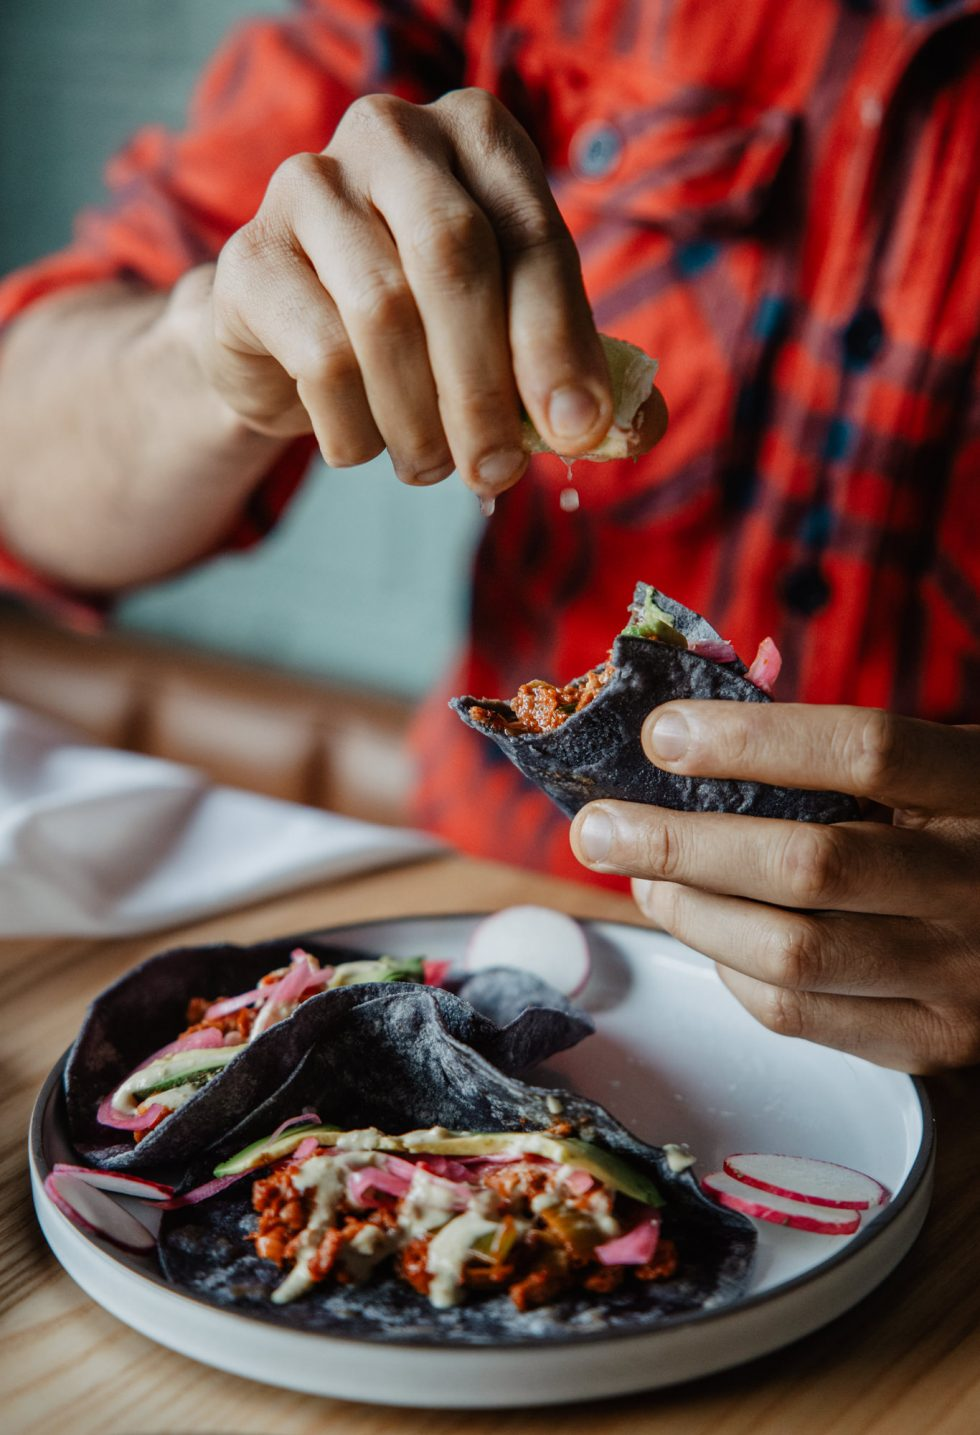 casa-kaizen-sushi-momo-christian-ventura-montreal-vegan-food-restaurant-photographer-laura-g-diaz-8